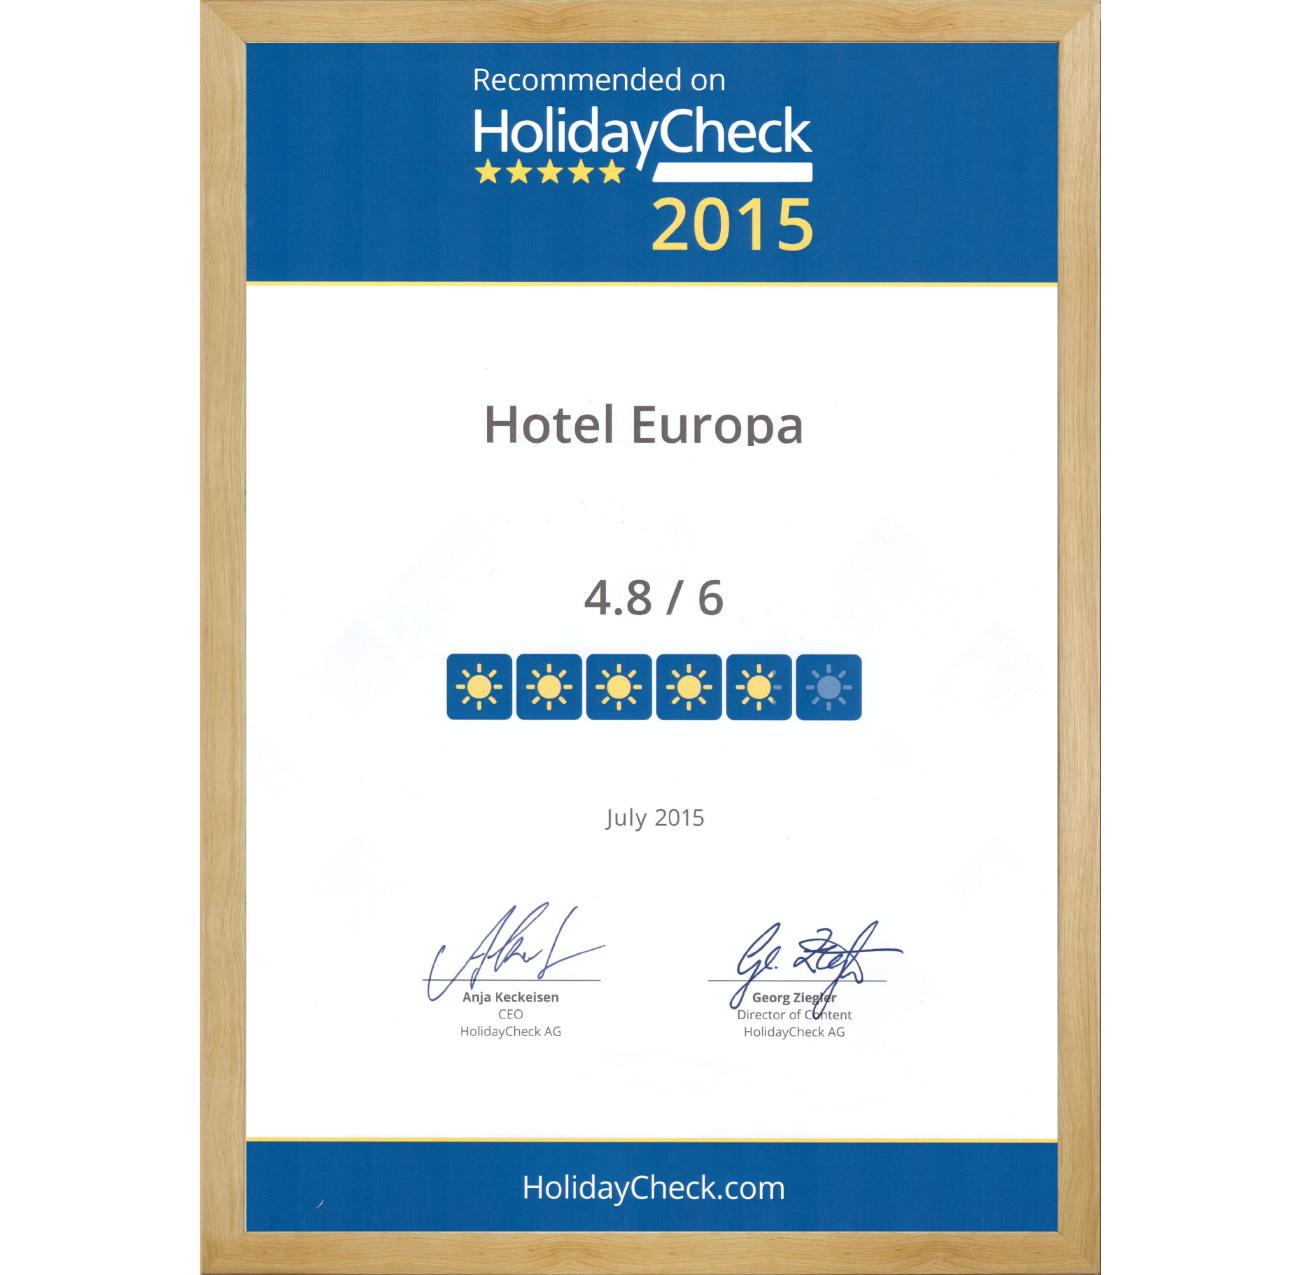 3 Sterne Hotel Garni - Hotel Europa Pforzheim